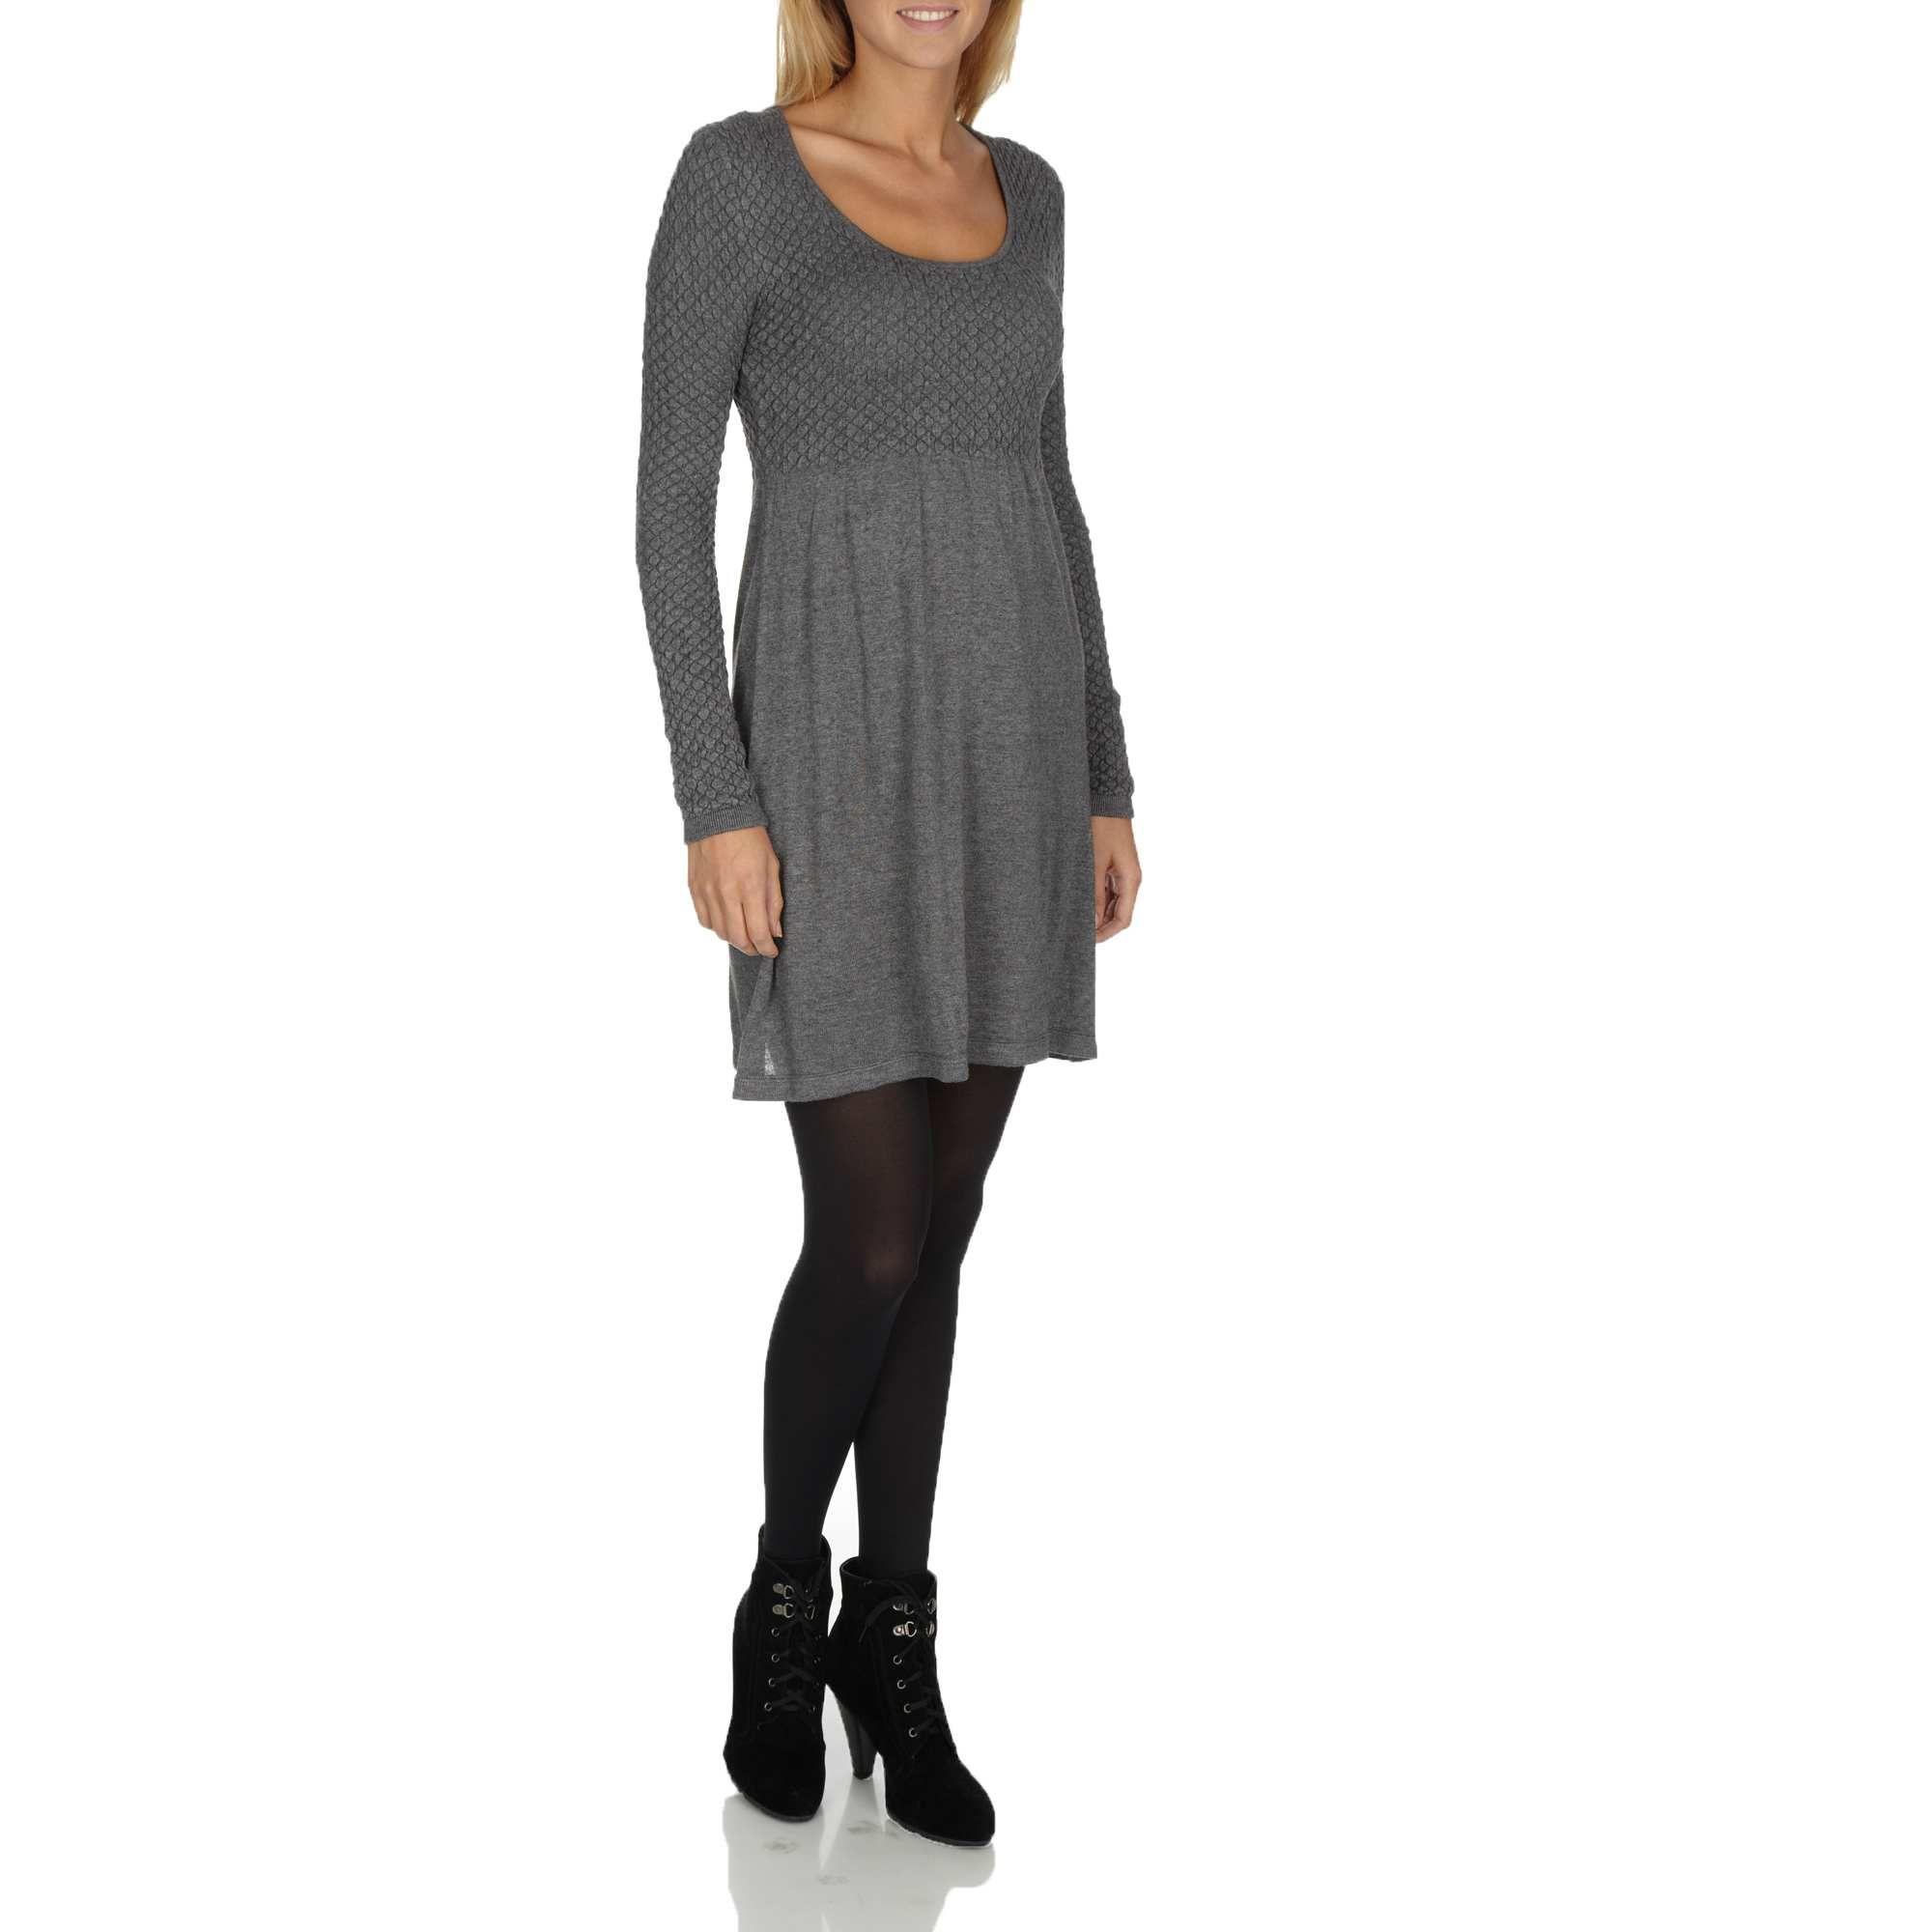 25285019e3a Vestido tipo jersey de punto ligero Kiabi. Vestido tipo jersey de punto  ligero Kiabi Ropa Online Mujer ...